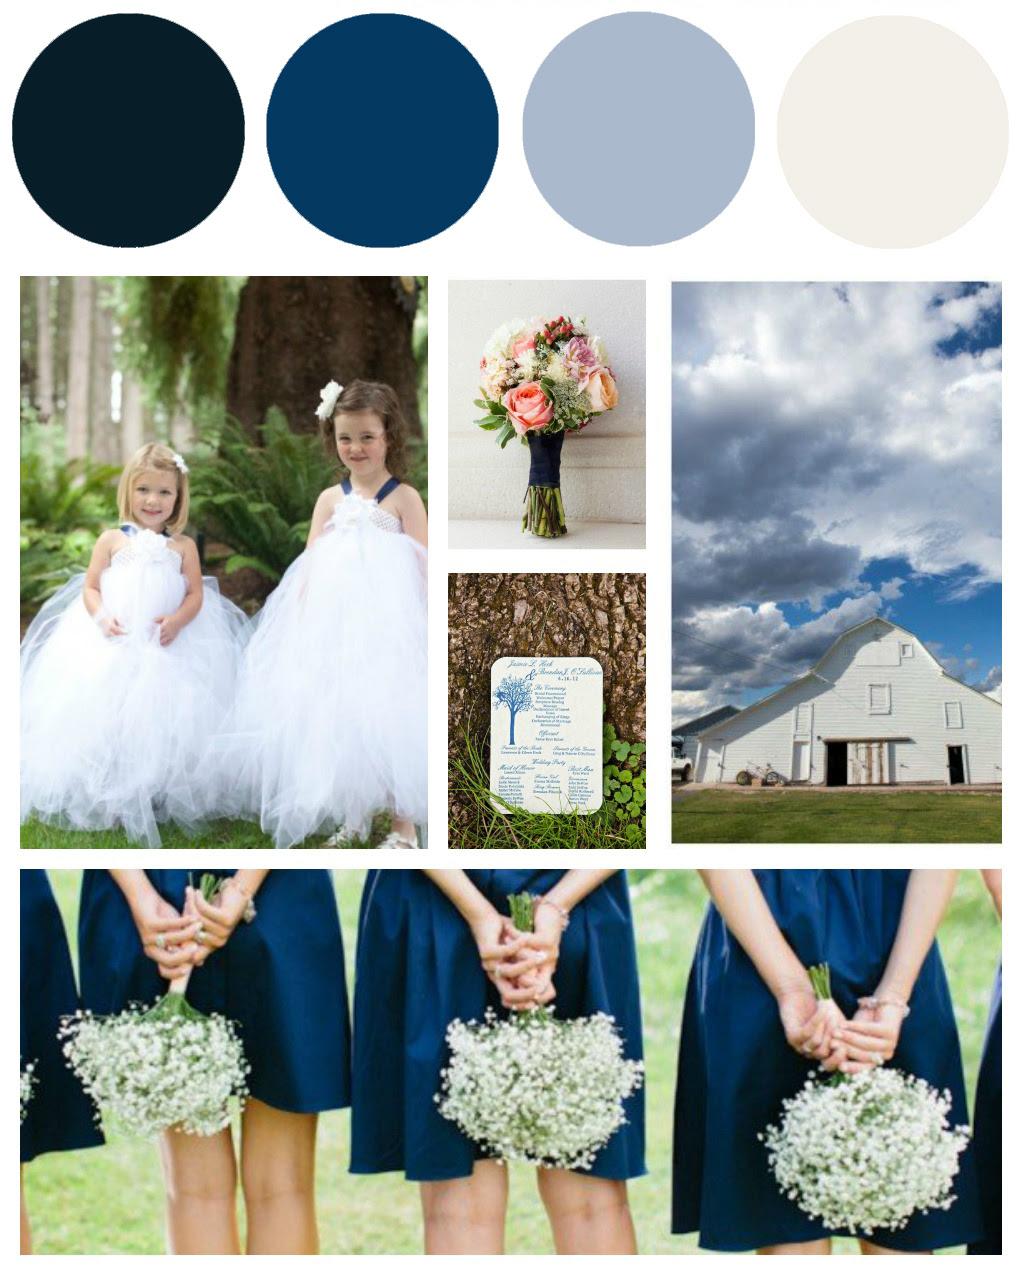 Blue & White Wedding Colors - Preppy Wedding Style